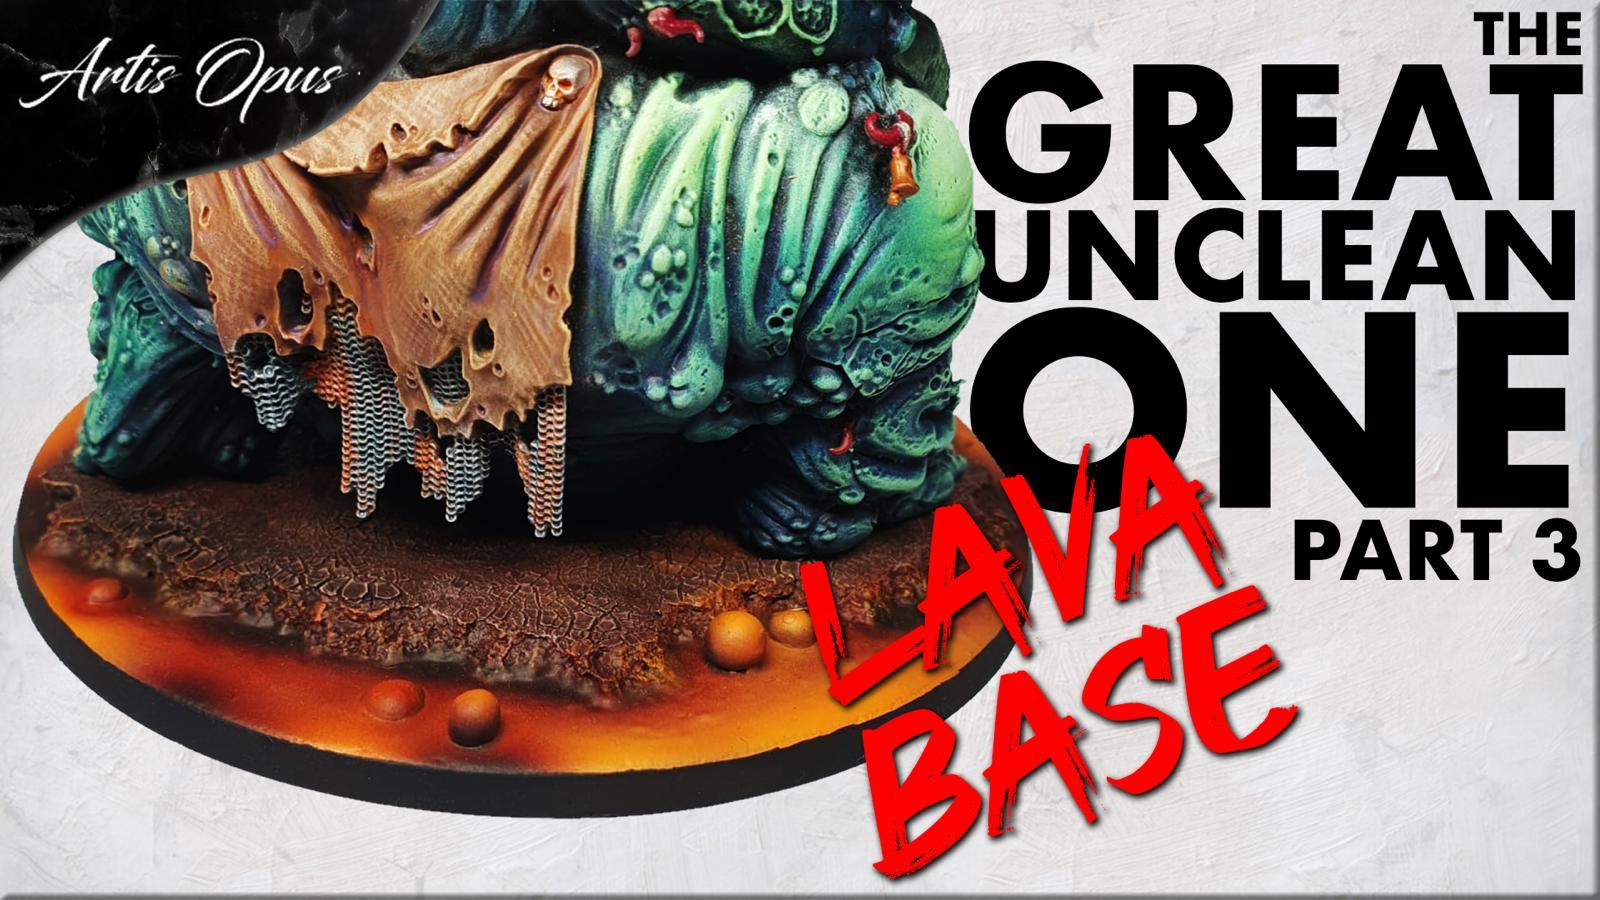 Artis Opus Great Unclean One Base Bundle